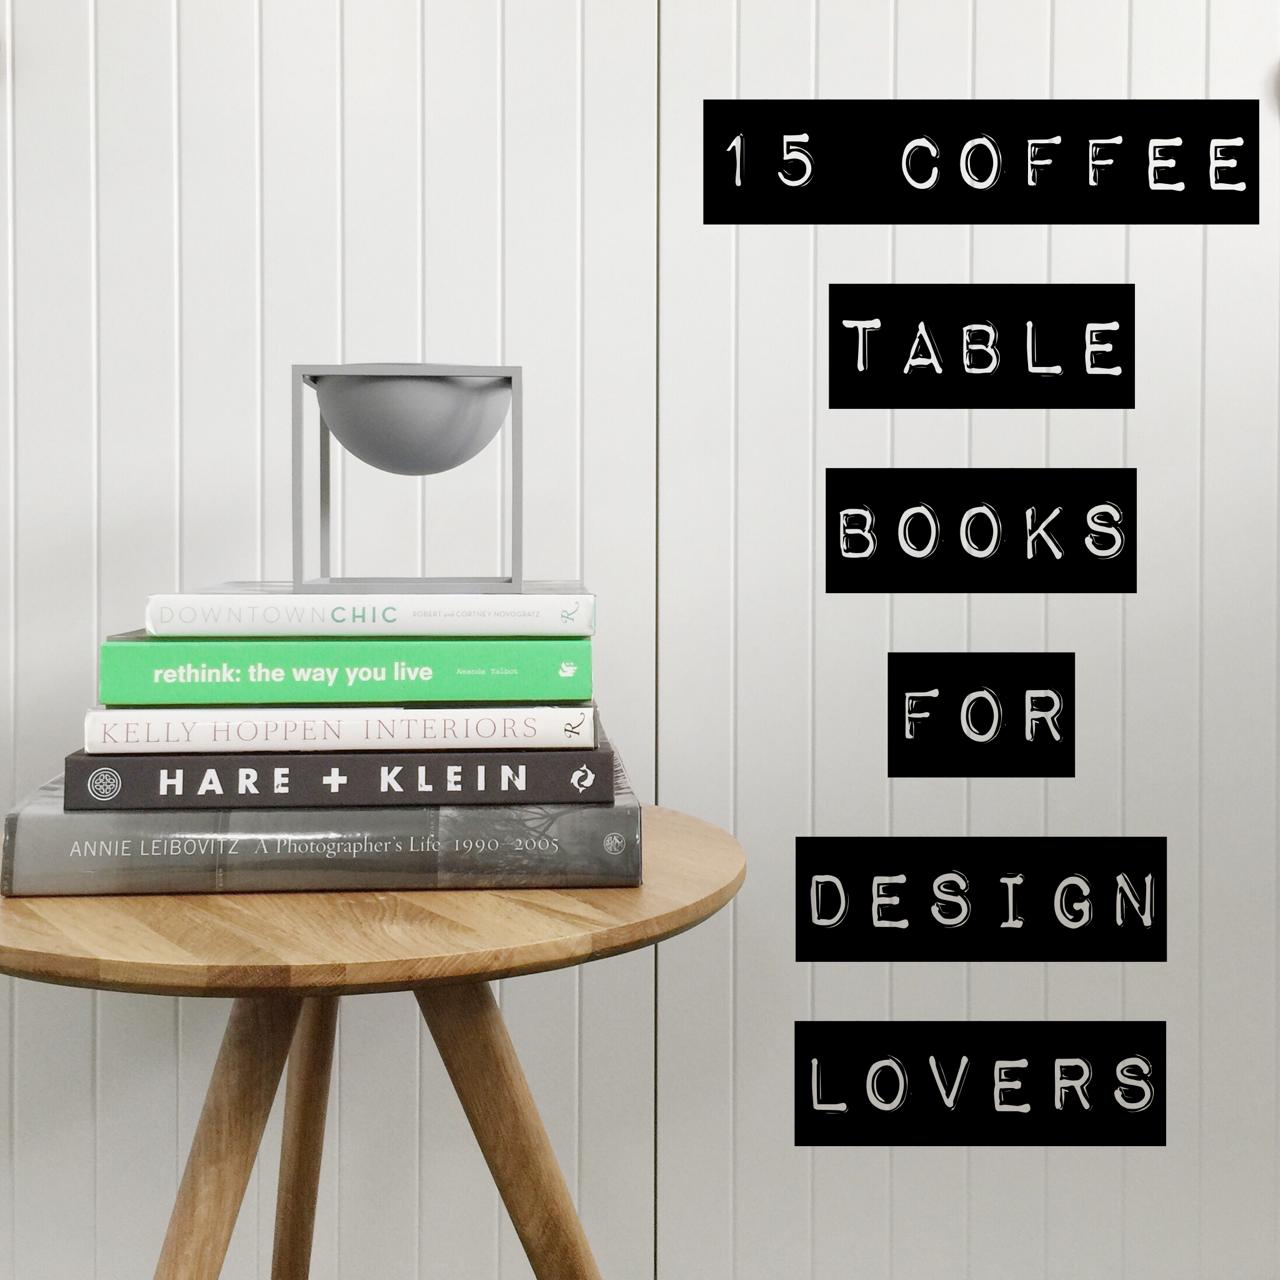 15 coffee table books for design lovers The Little Design Corner